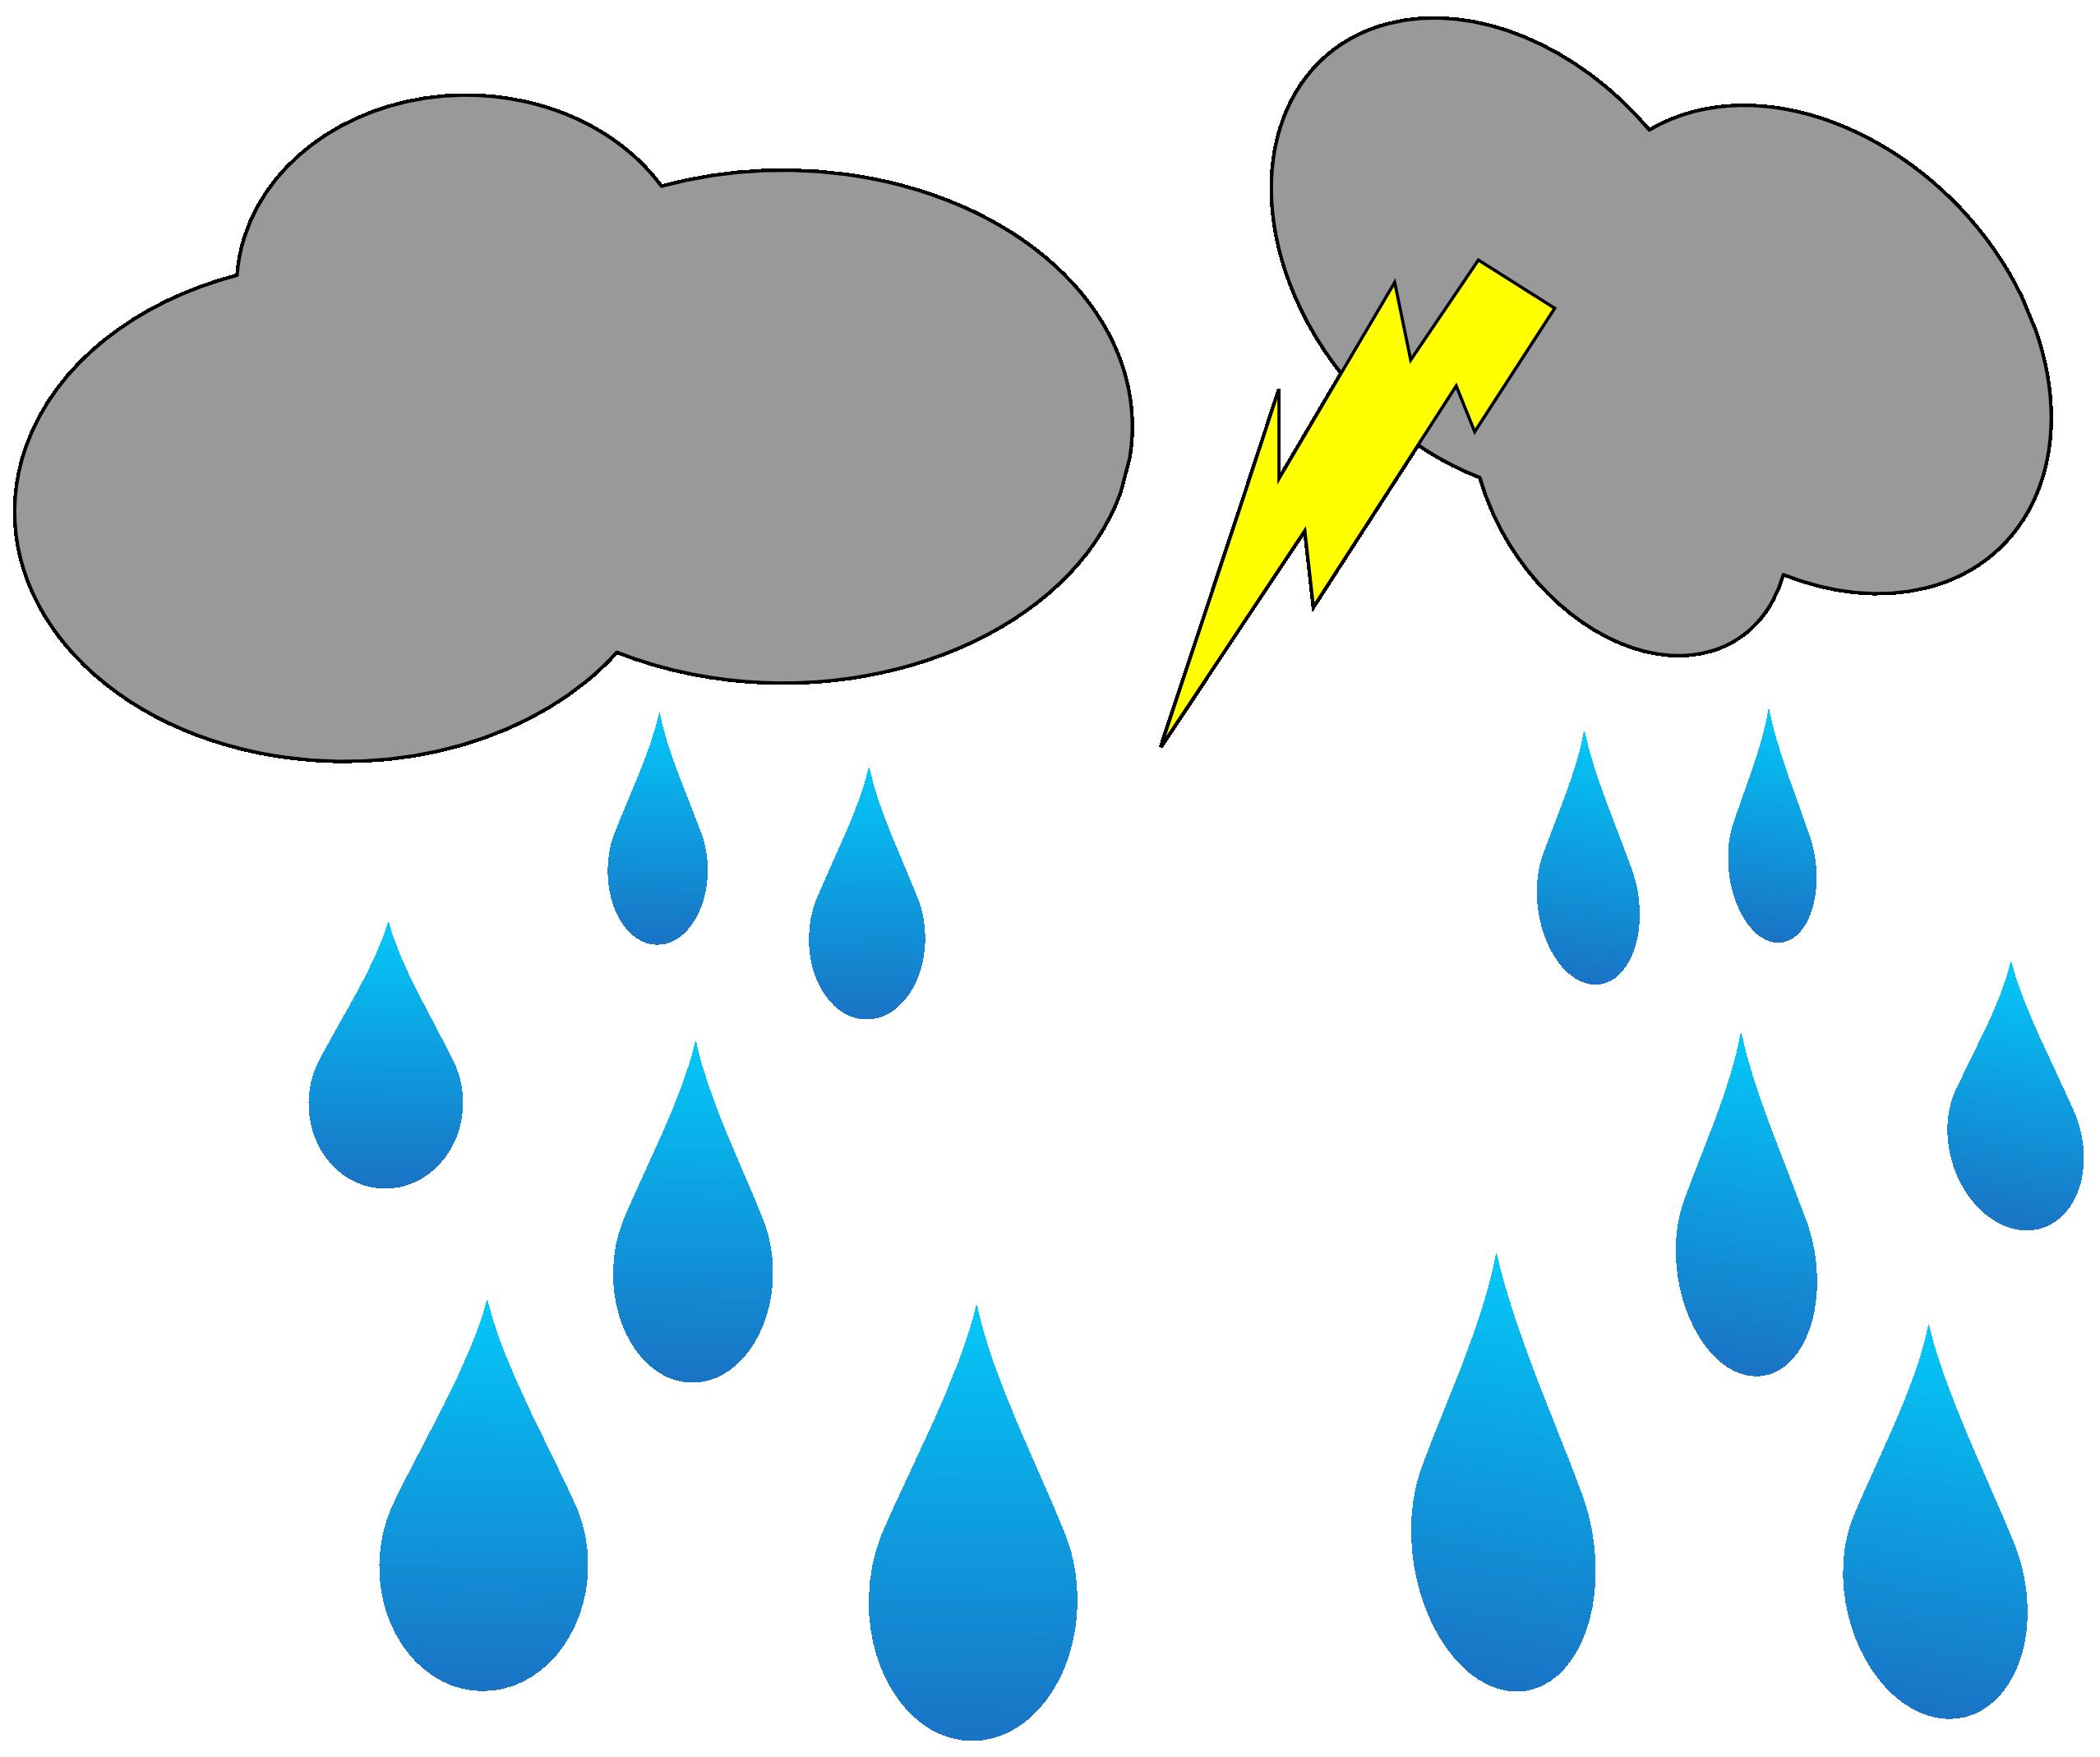 Drawn clouds rain drawing Lightning Panda Cloud Info Free